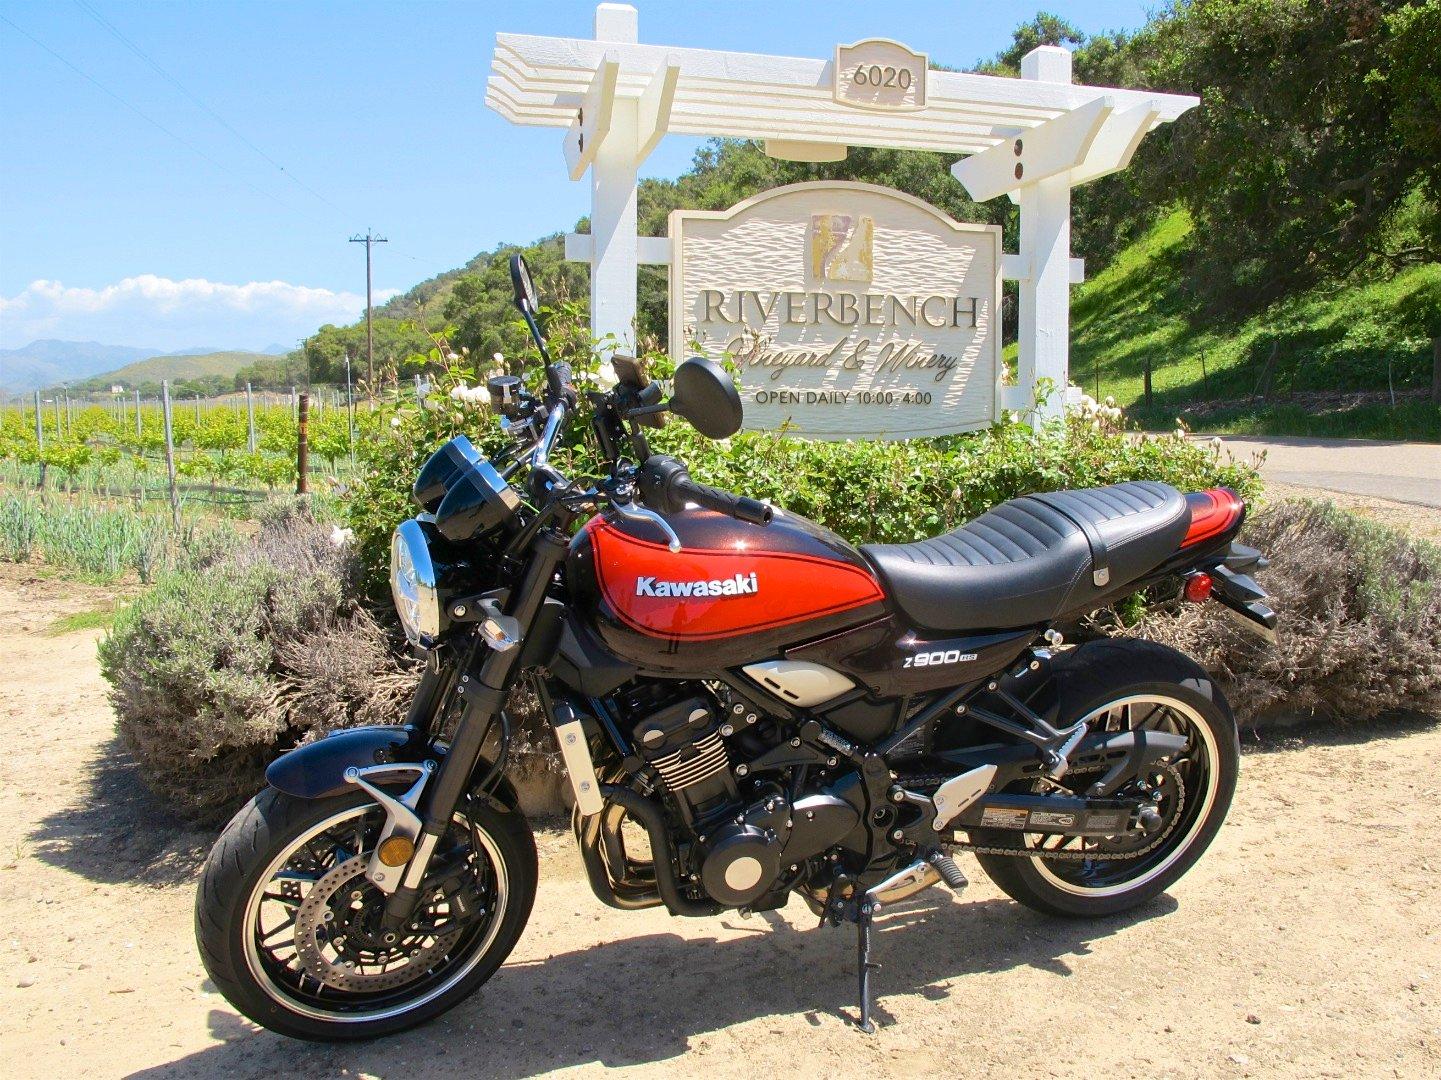 Riding the Kawasaki Z900RS to the Quail Z900RS